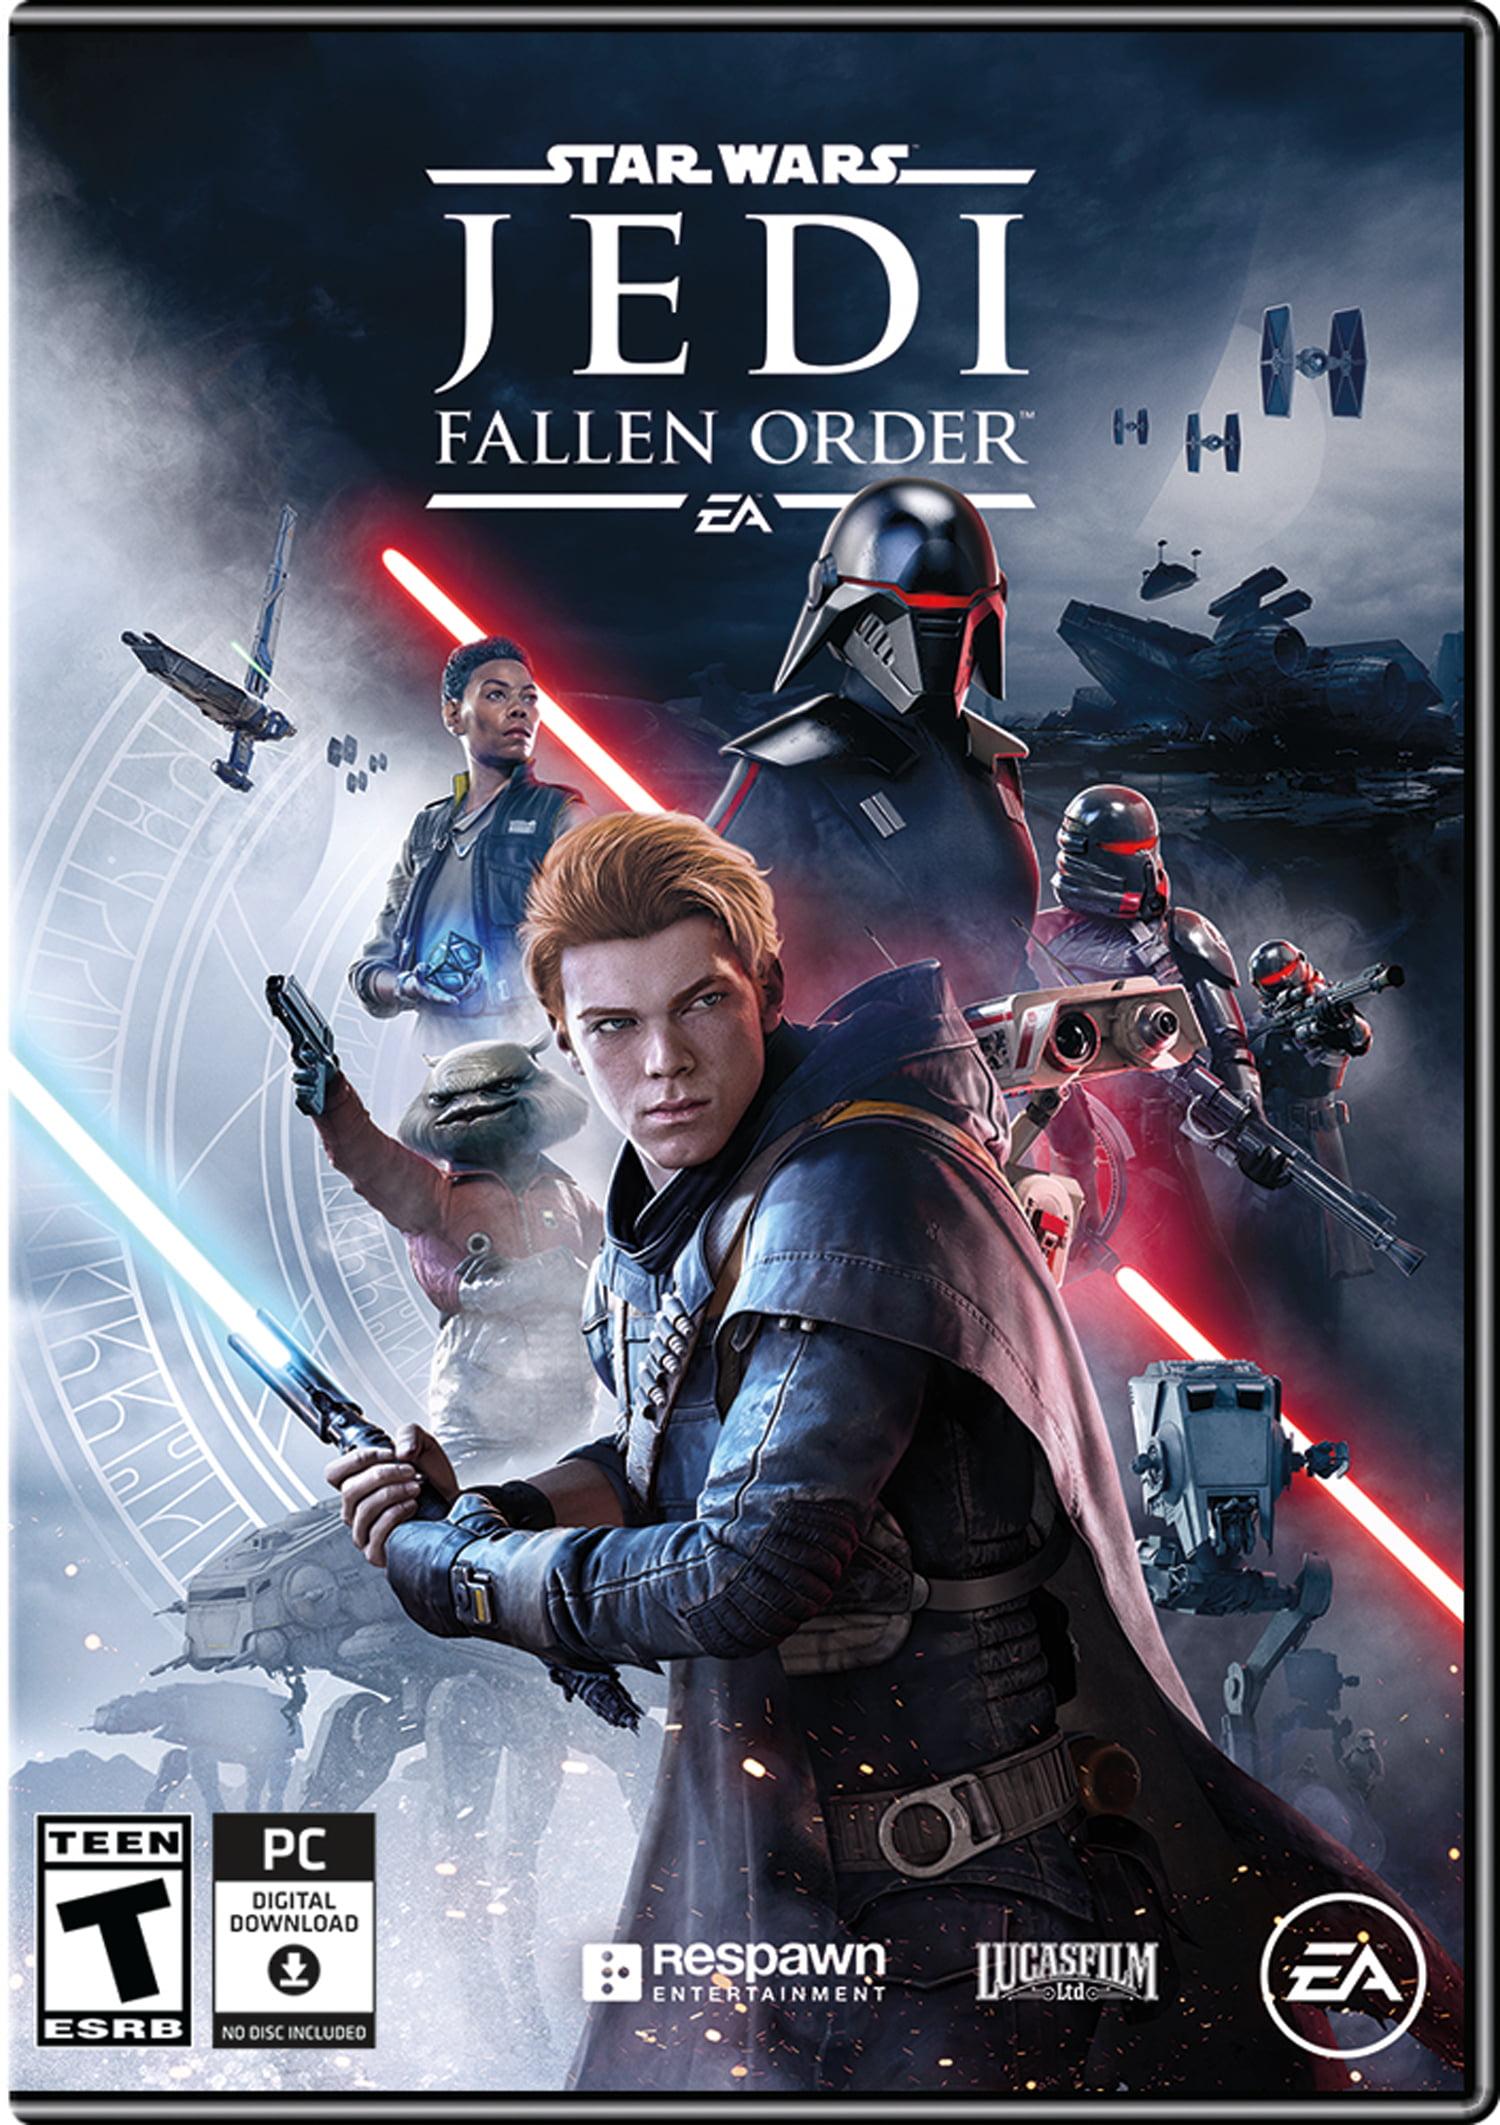 Star Wars Jedi: Fallen Order, Electronic Arts, PC, 014633373073